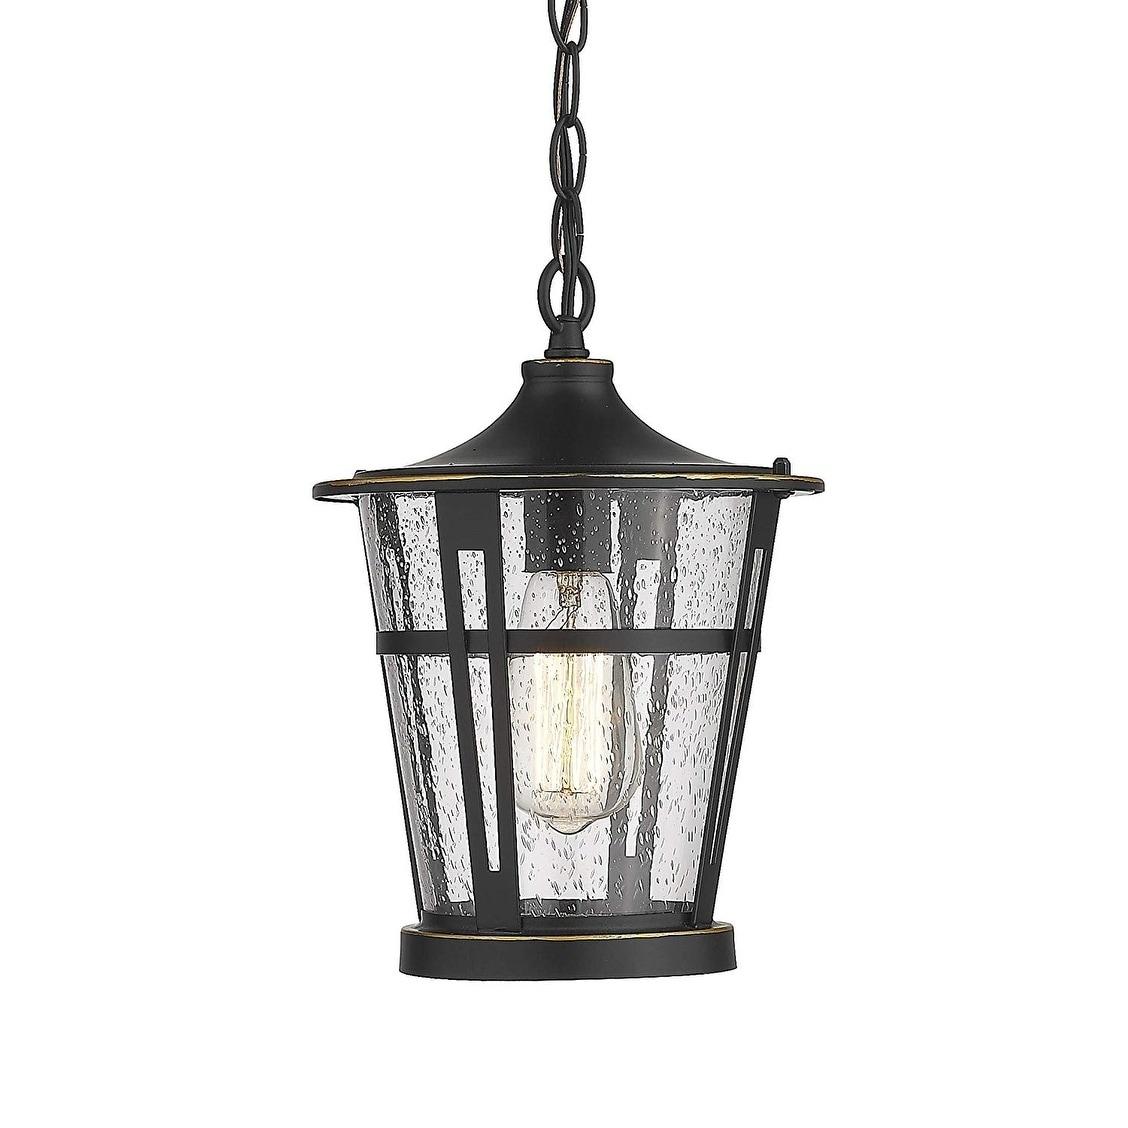 1 Light Outdoor Hanging Lantern Light Fixtures Patio Hanging Light On Sale Overstock 30740268